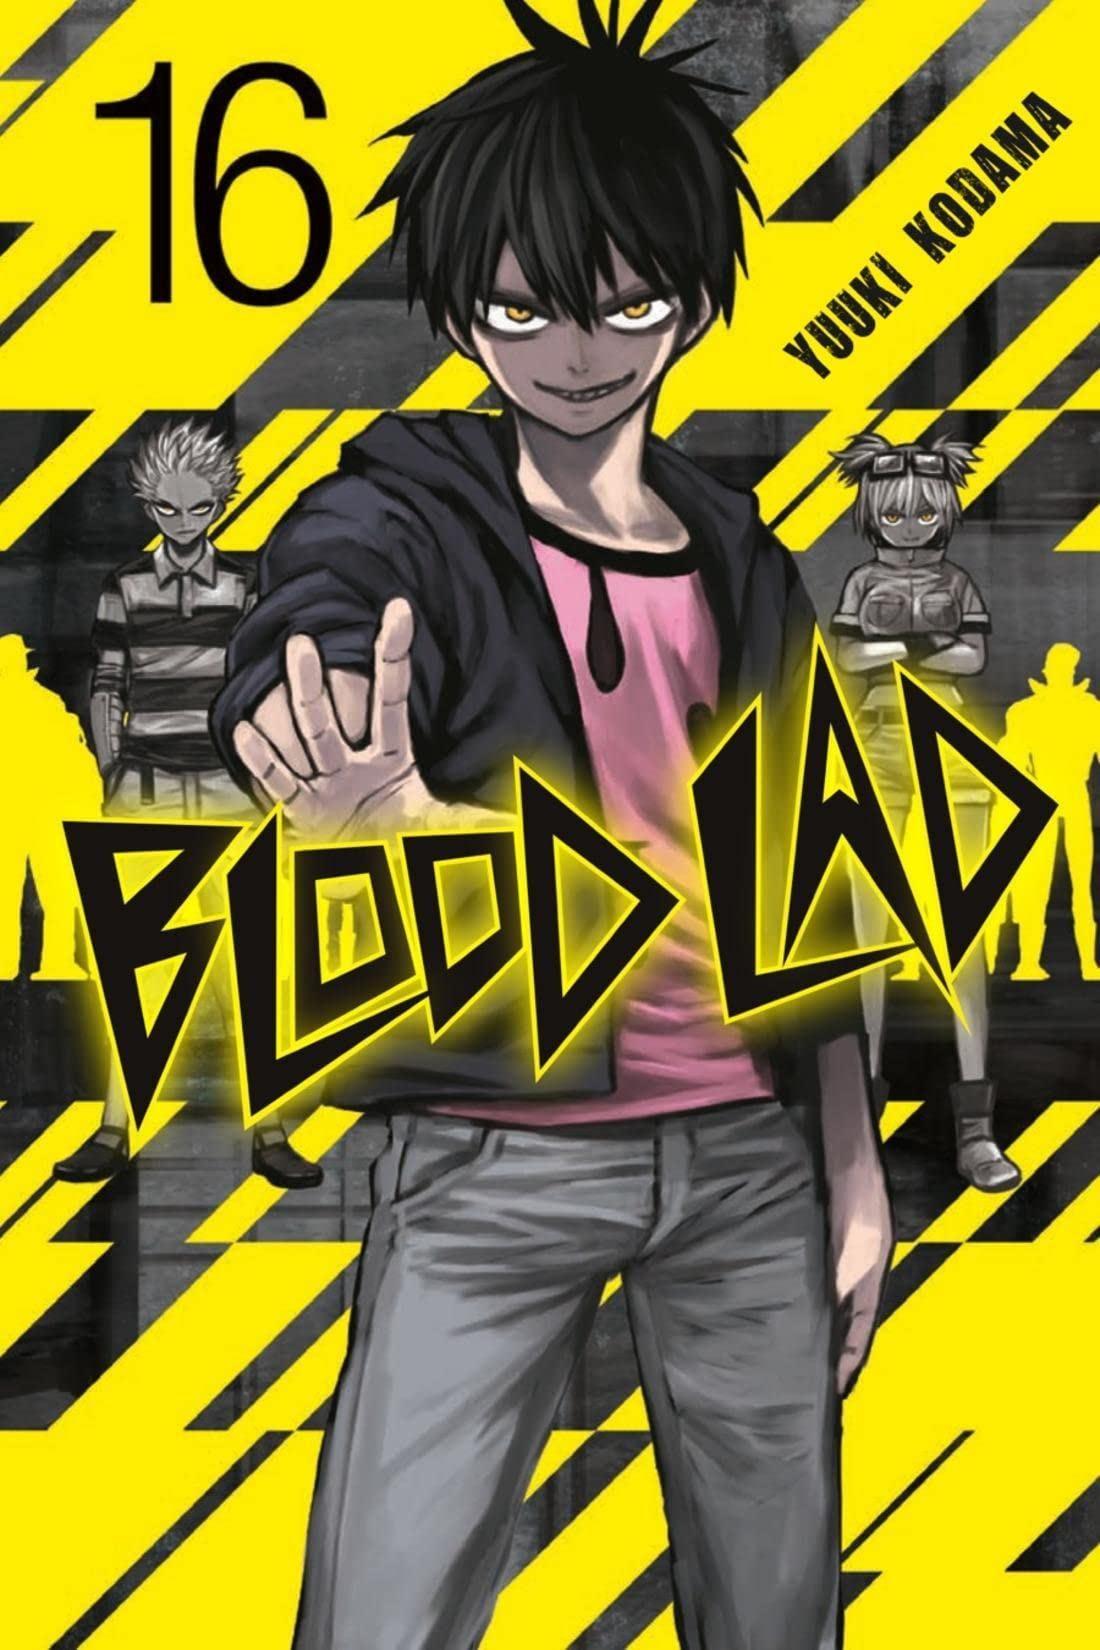 Cover Volume 16